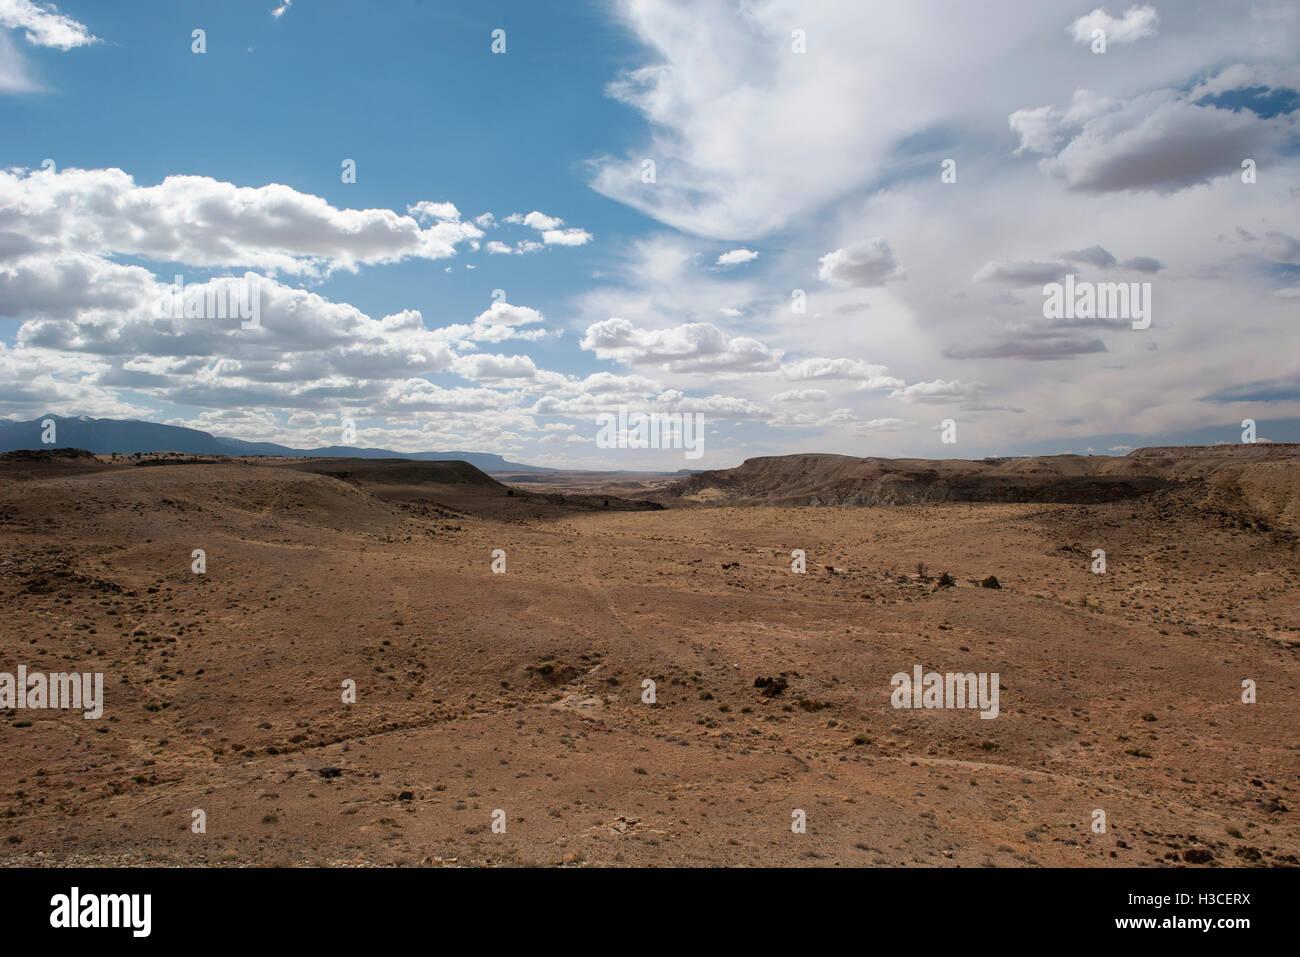 Desert landscape in the Four Corners region of Southwestern USA - Stock Image